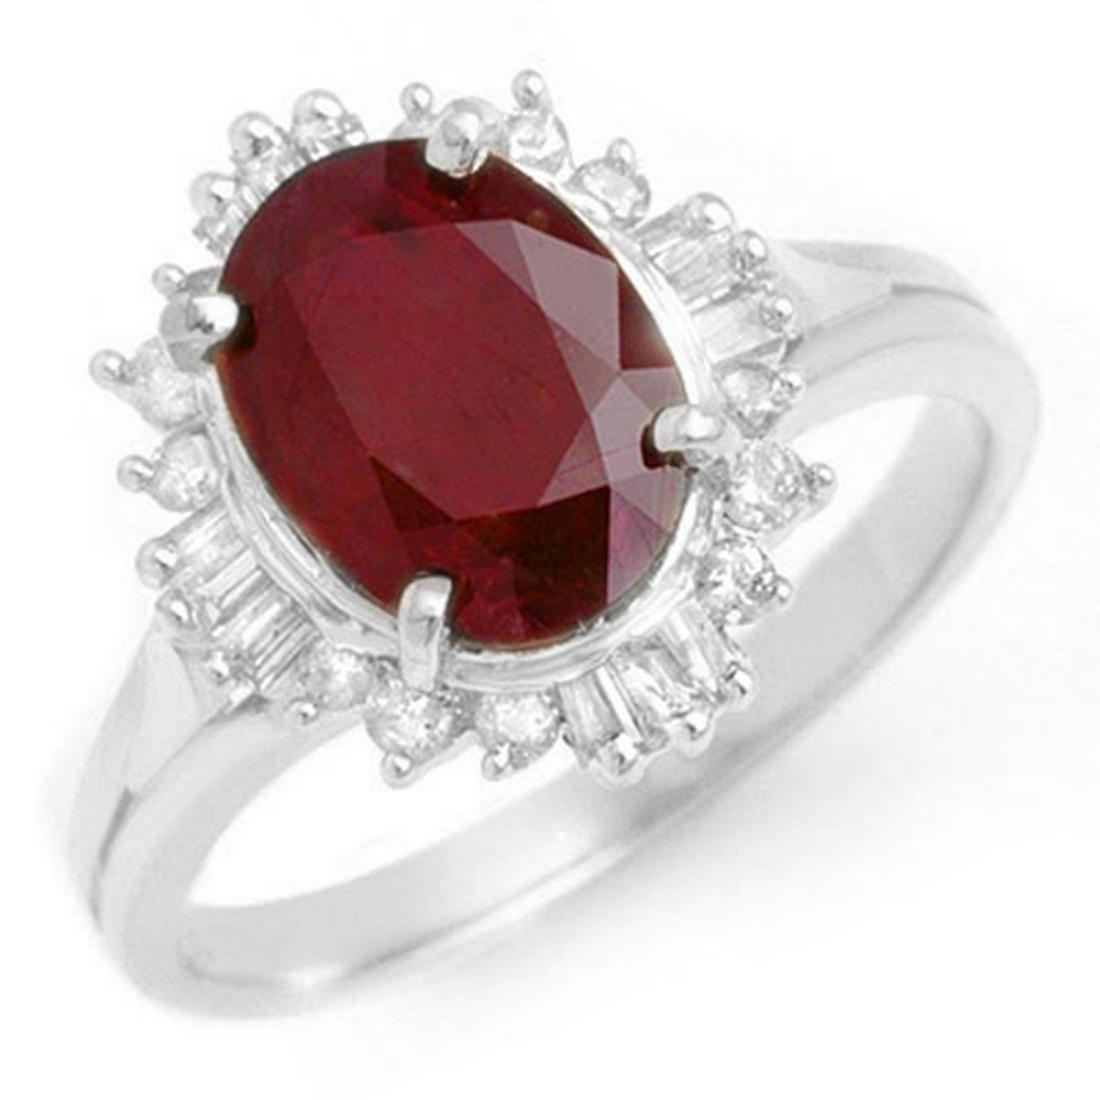 2.55 ctw Ruby & Diamond Ring 18K White Gold - REF-79F3N